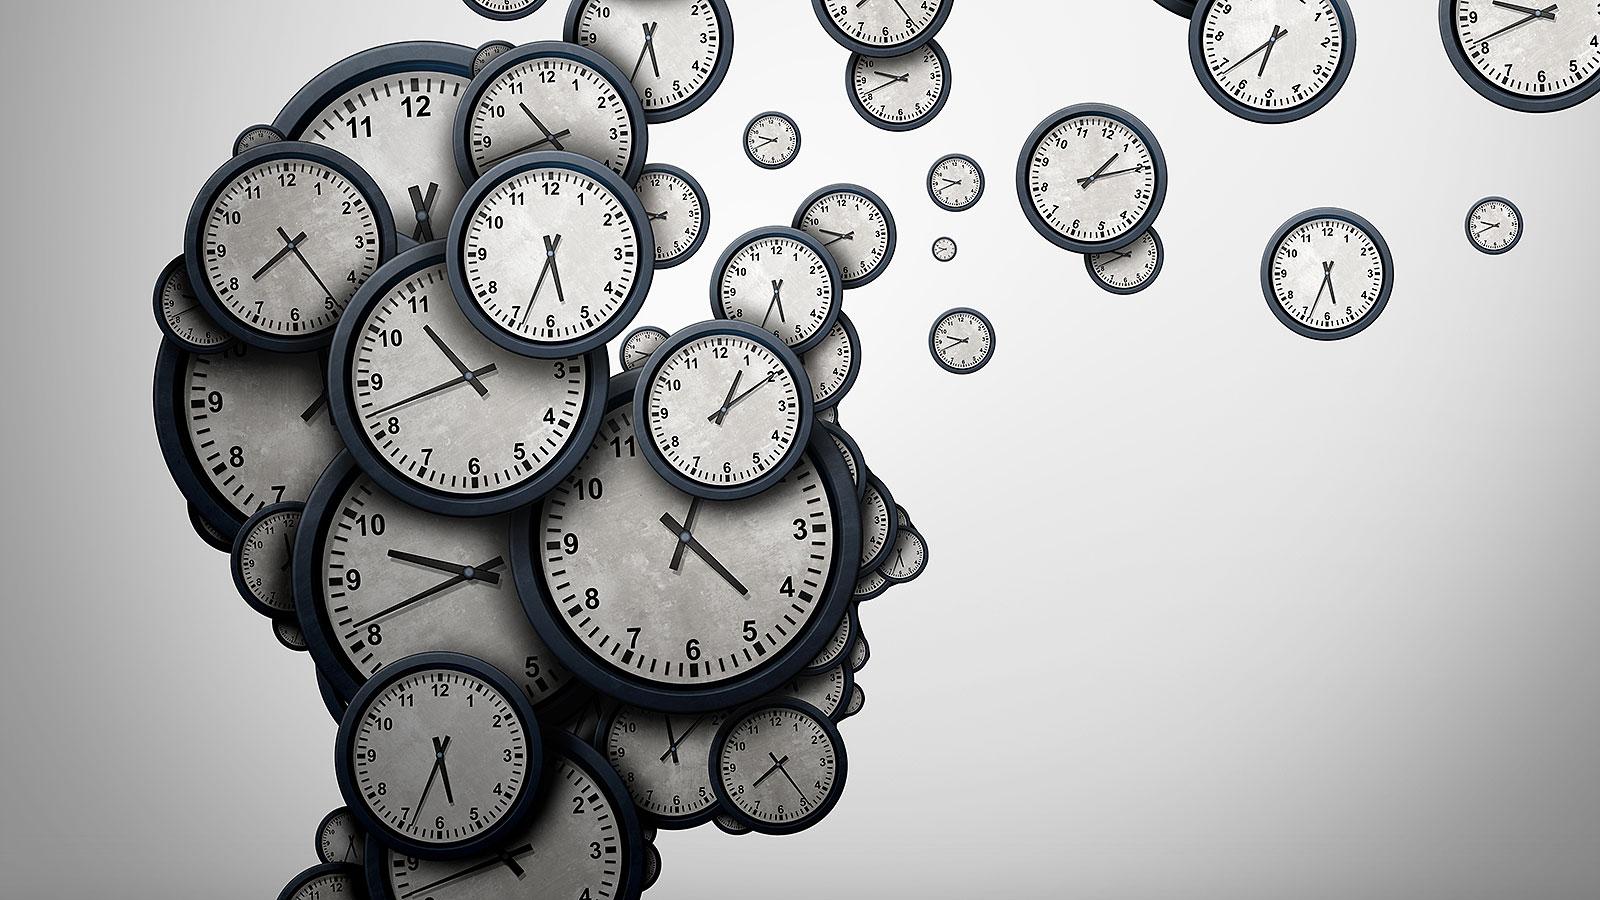 فلسفه مدیریت زمان!